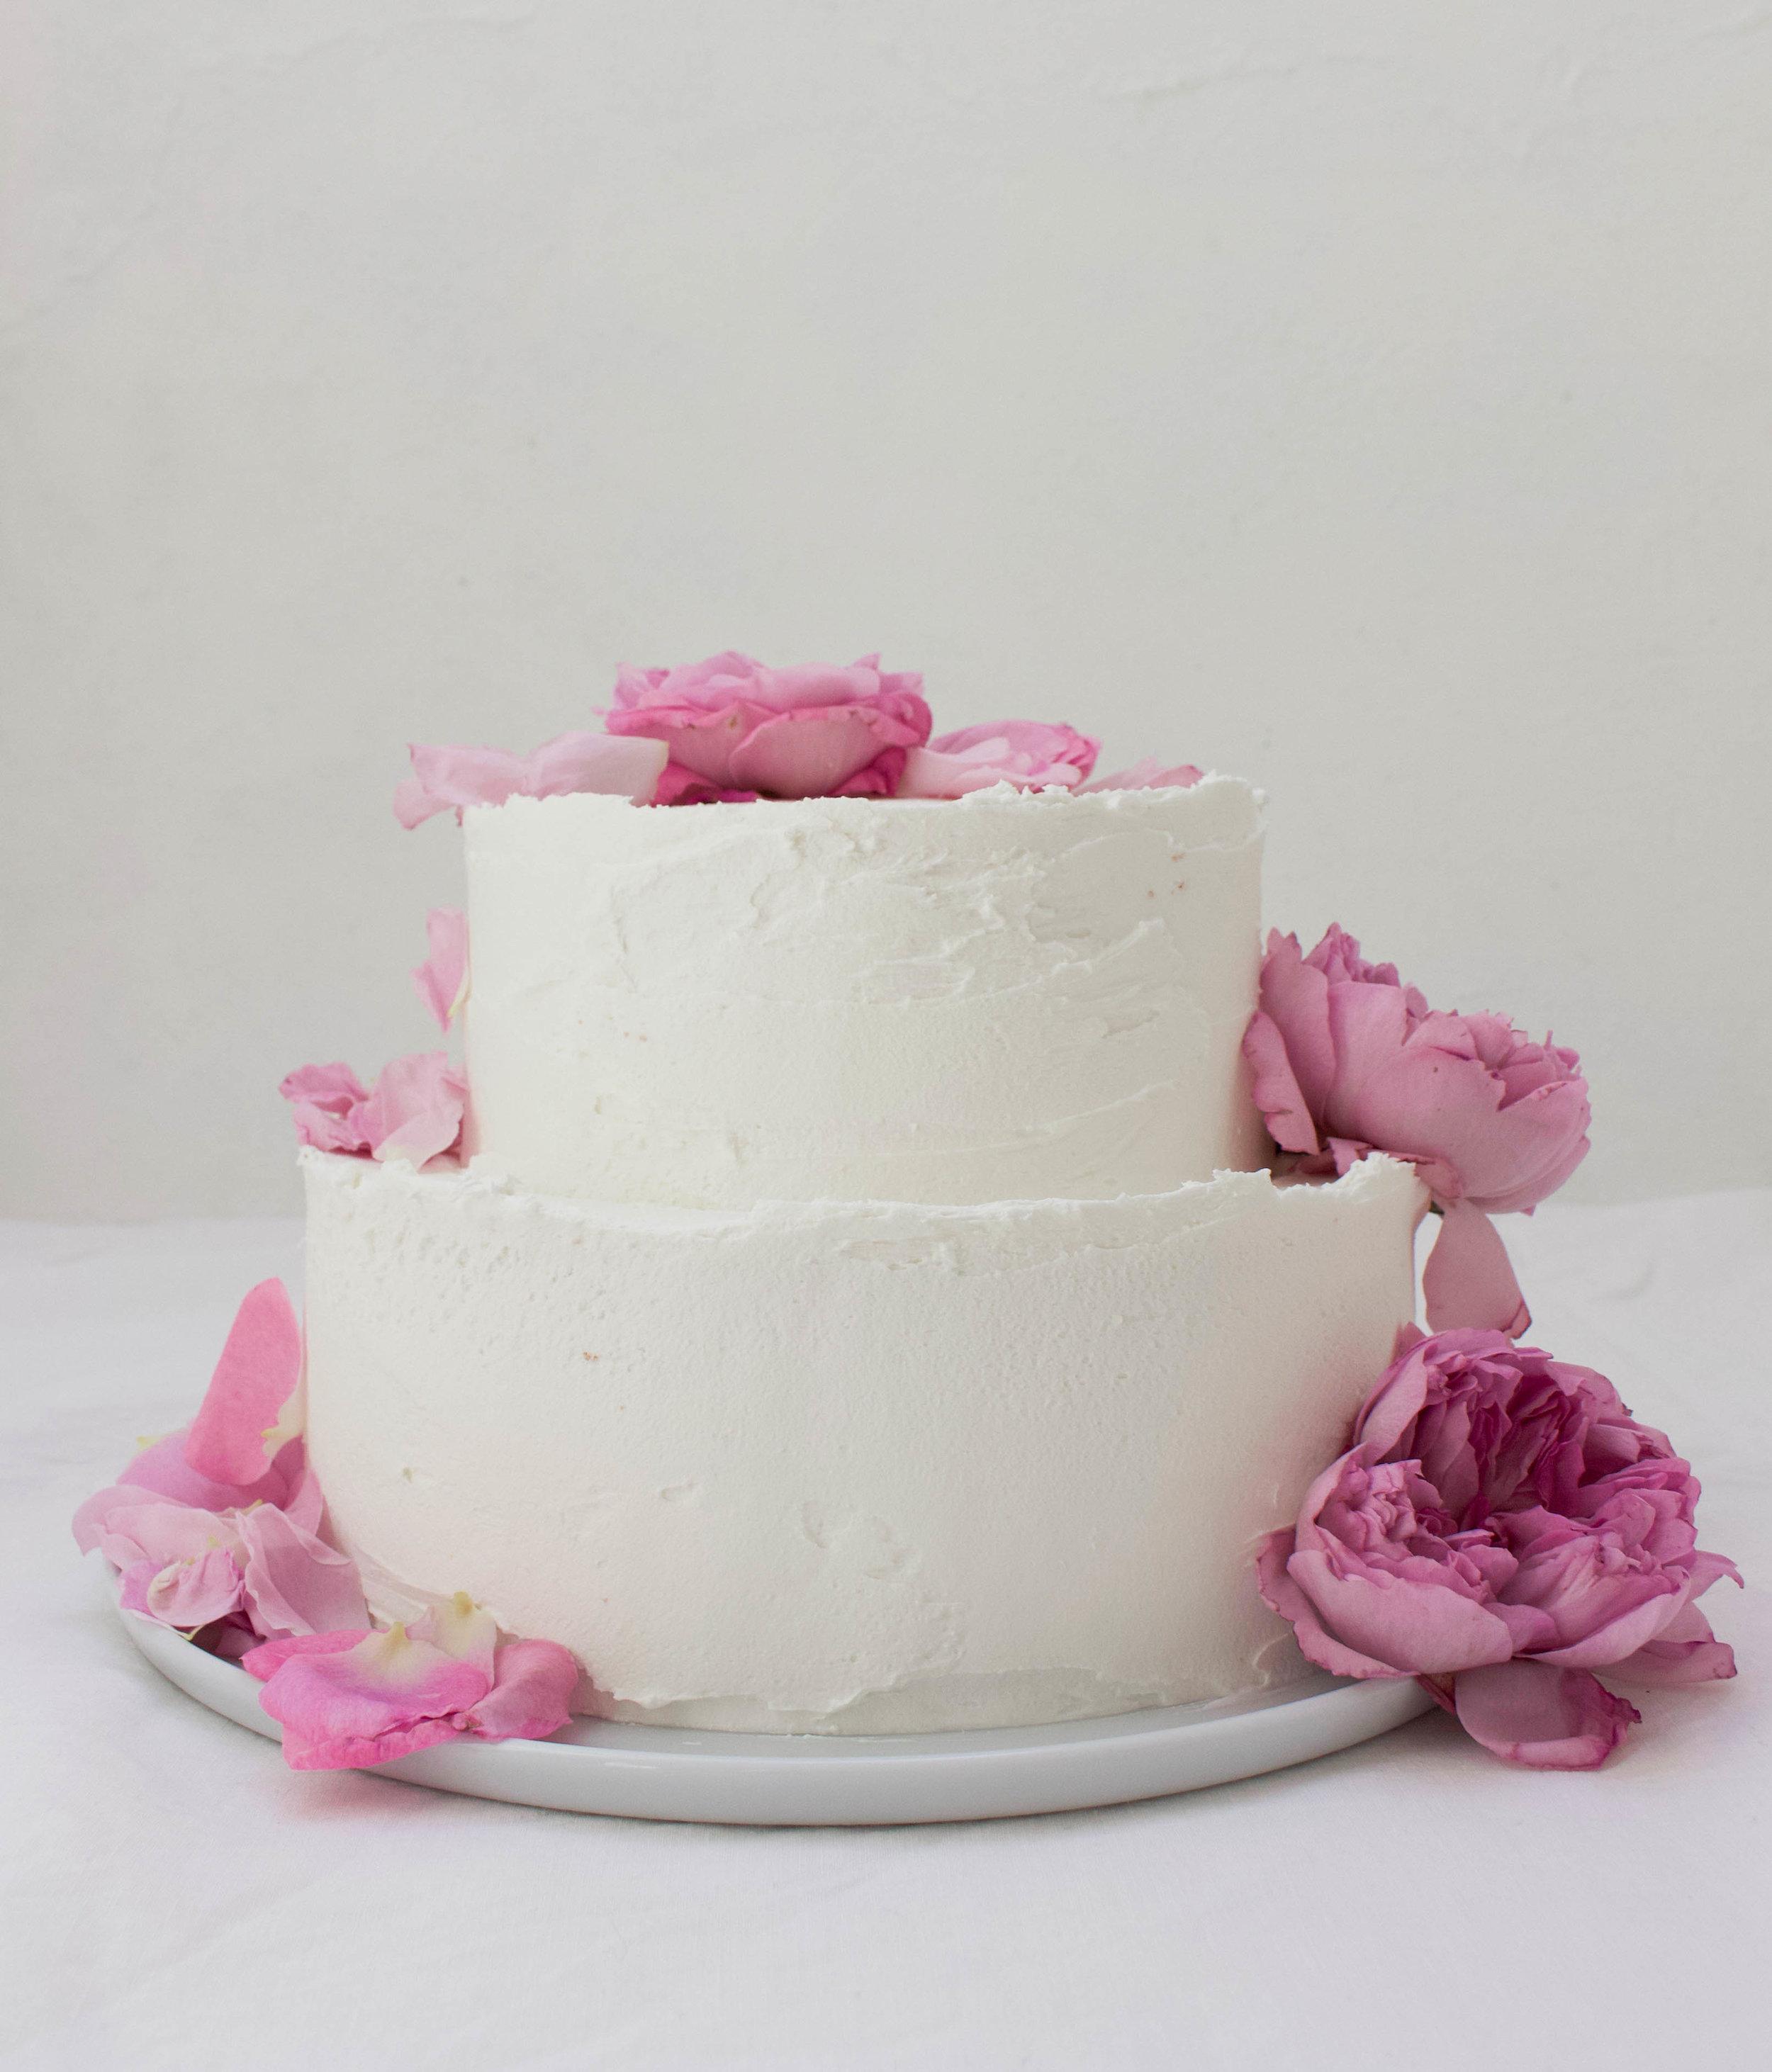 < buttermilk sponge w/ summer berry filling & vanilla frosting  wedding cake >